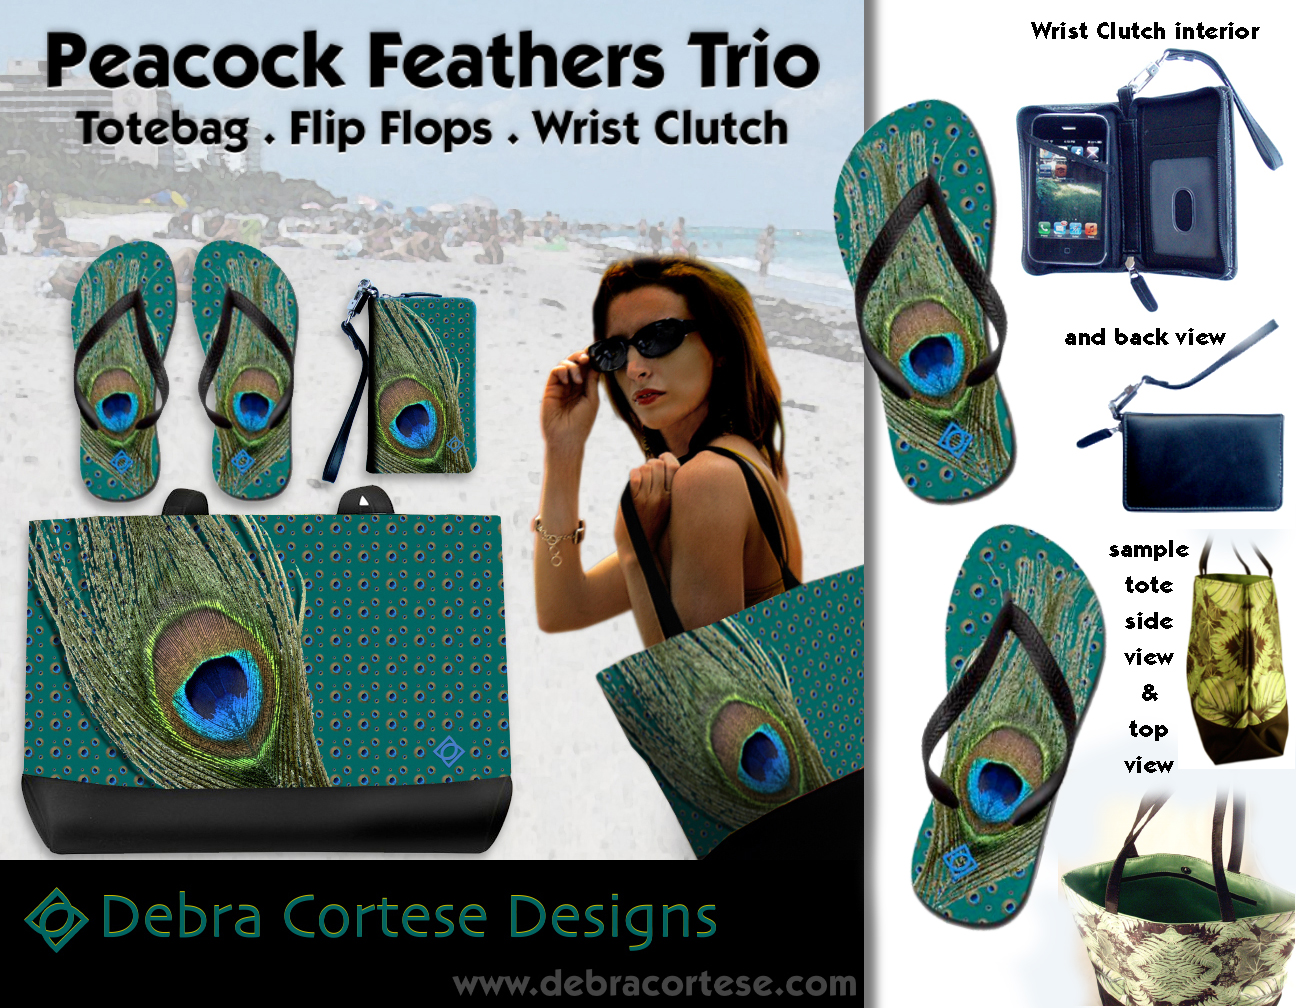 756ac28124b99c Debra Cortese Designs introduces the Peacock Feathers TRIO ...